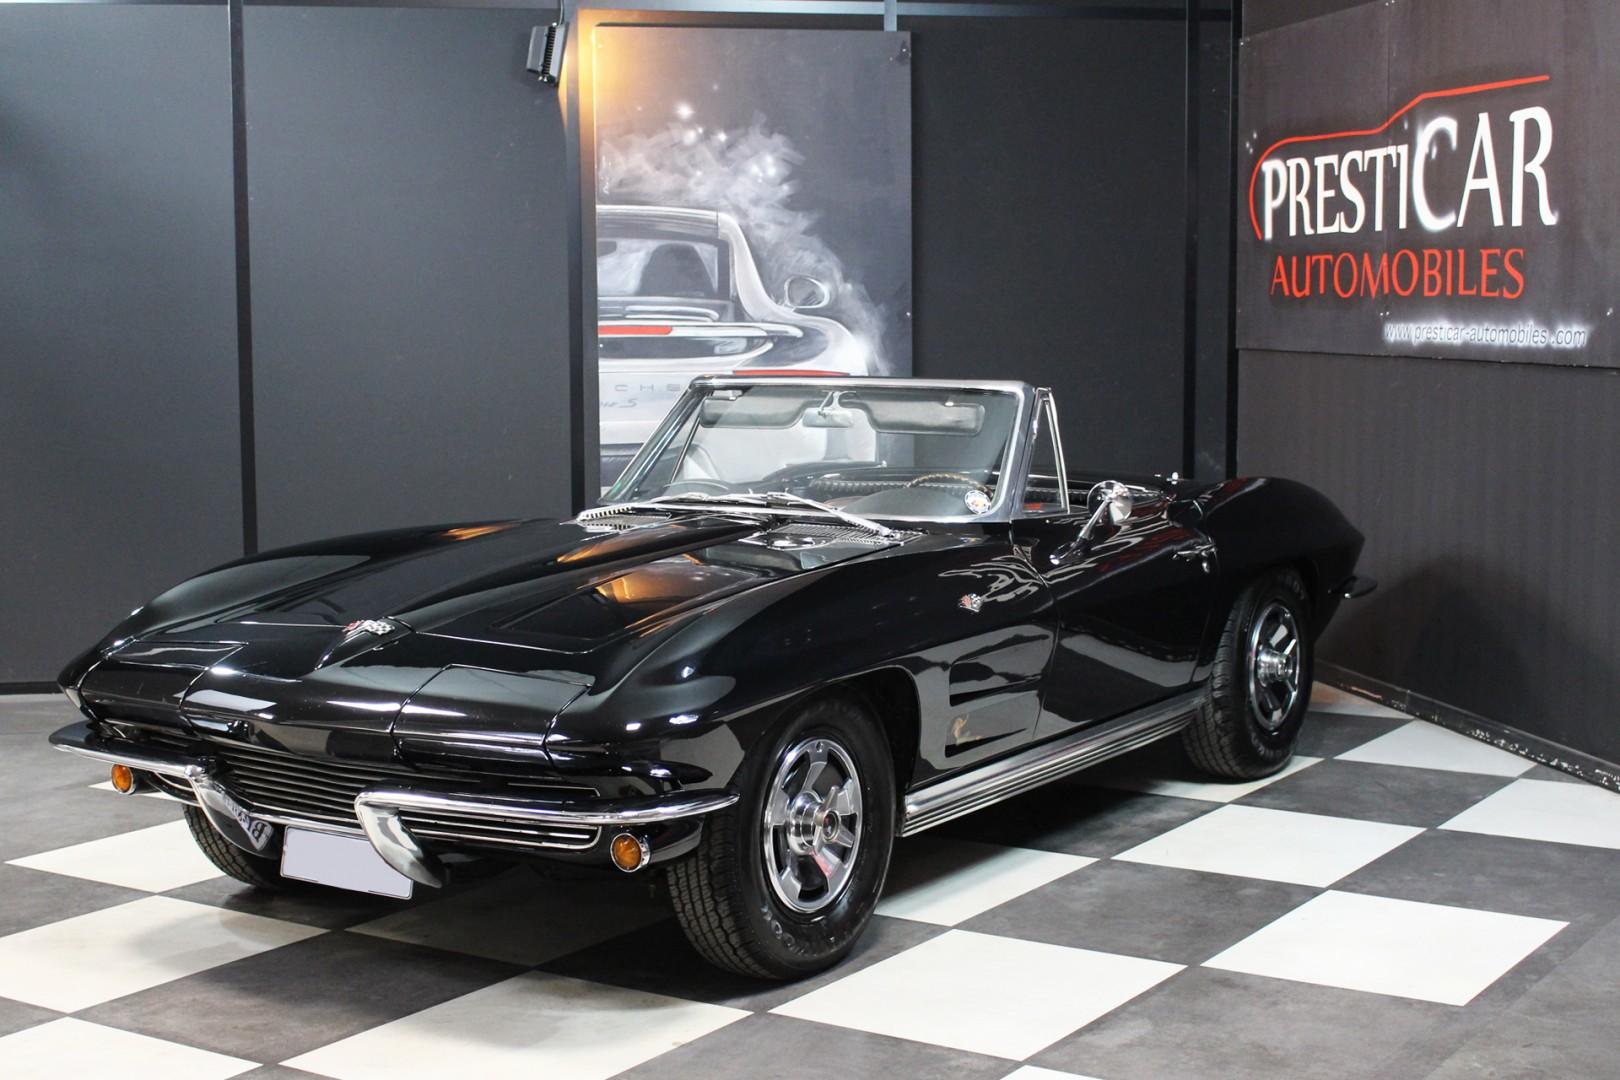 corvette c2 v8 327ci 300 ch bvm4 1964 presticar automobiles. Black Bedroom Furniture Sets. Home Design Ideas